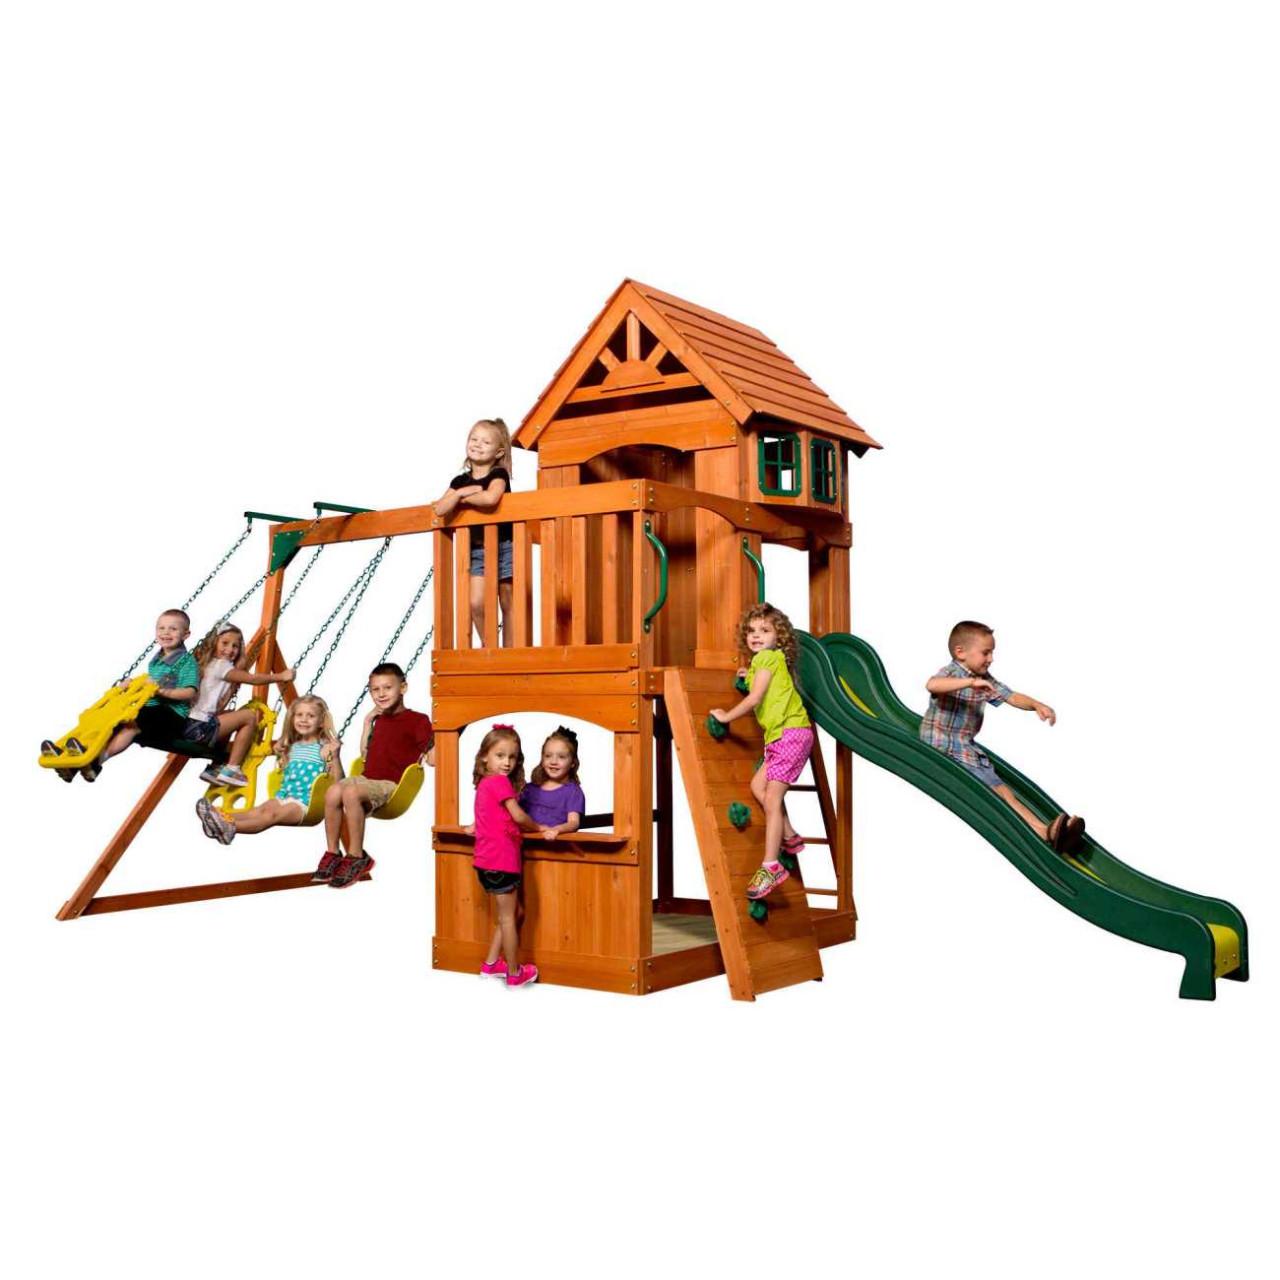 Spielturm Atlantic von Backyard